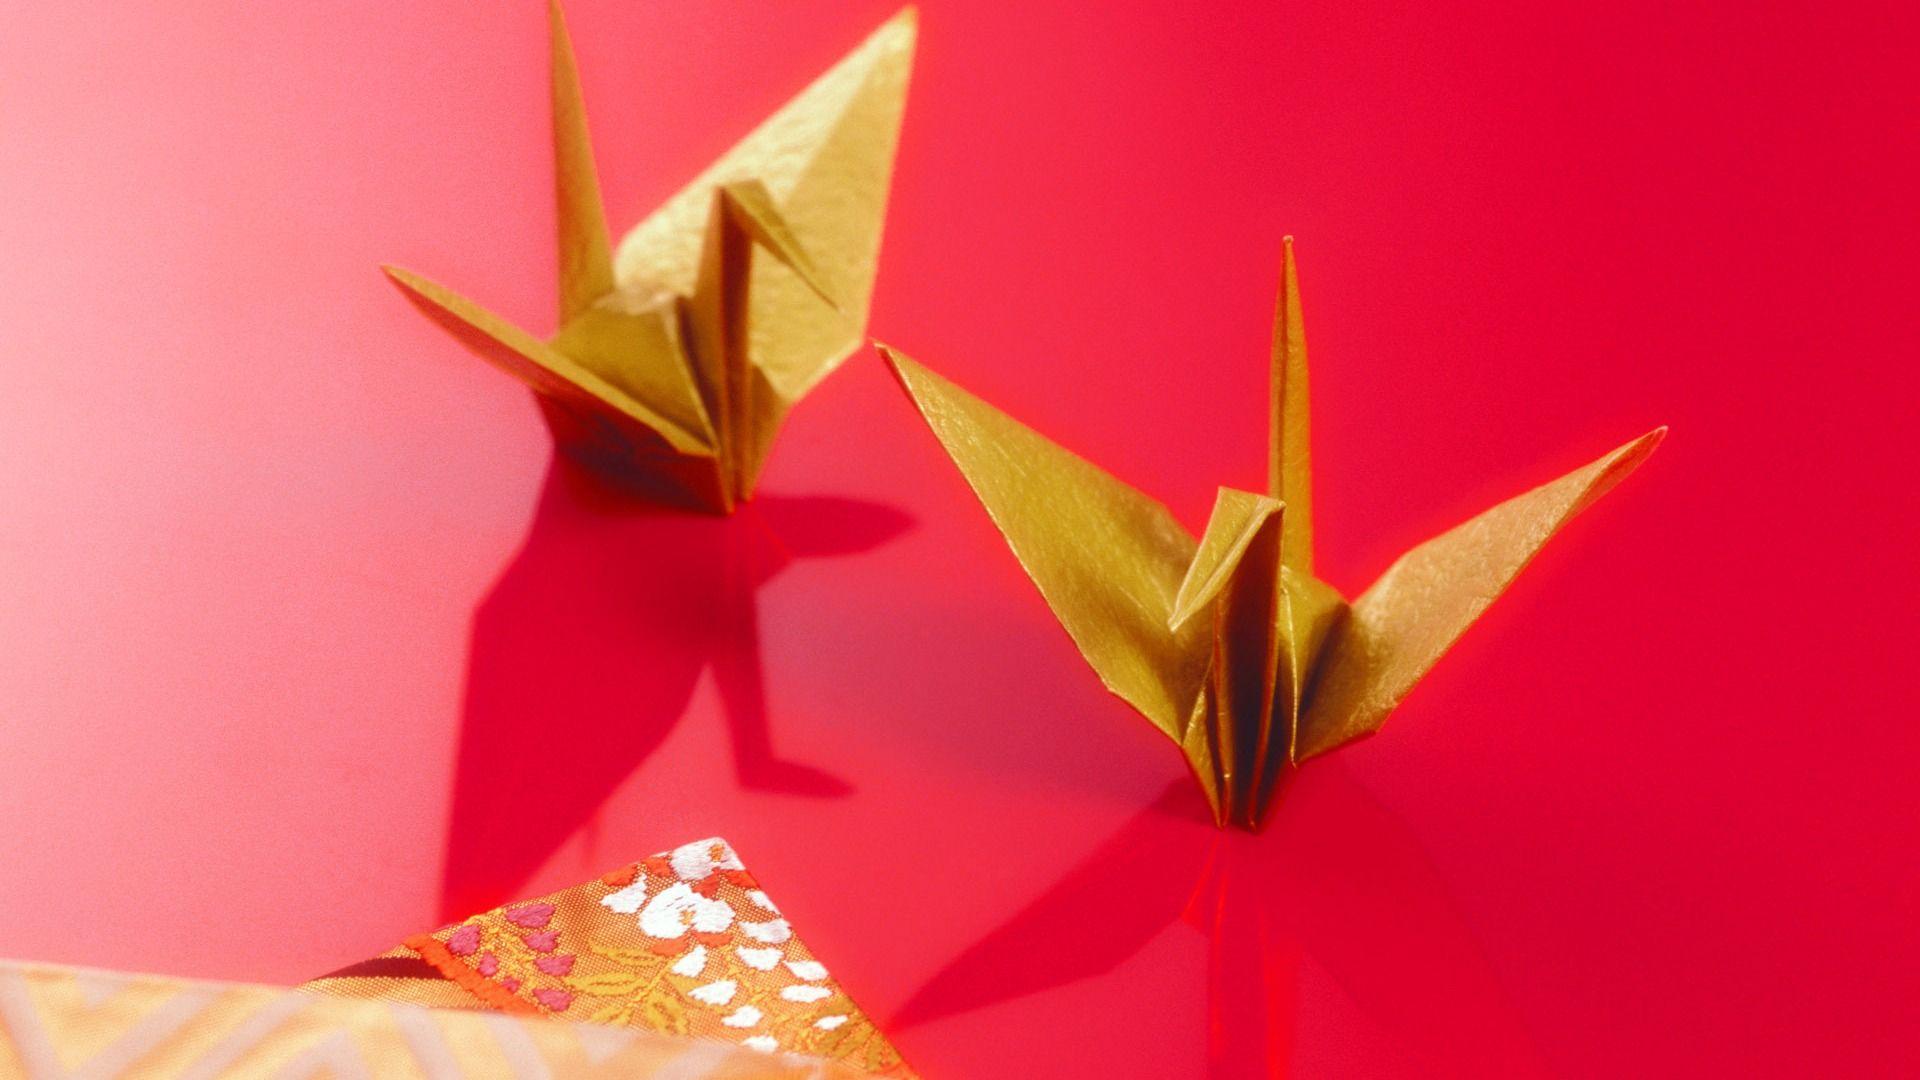 Origami hd wallpaper